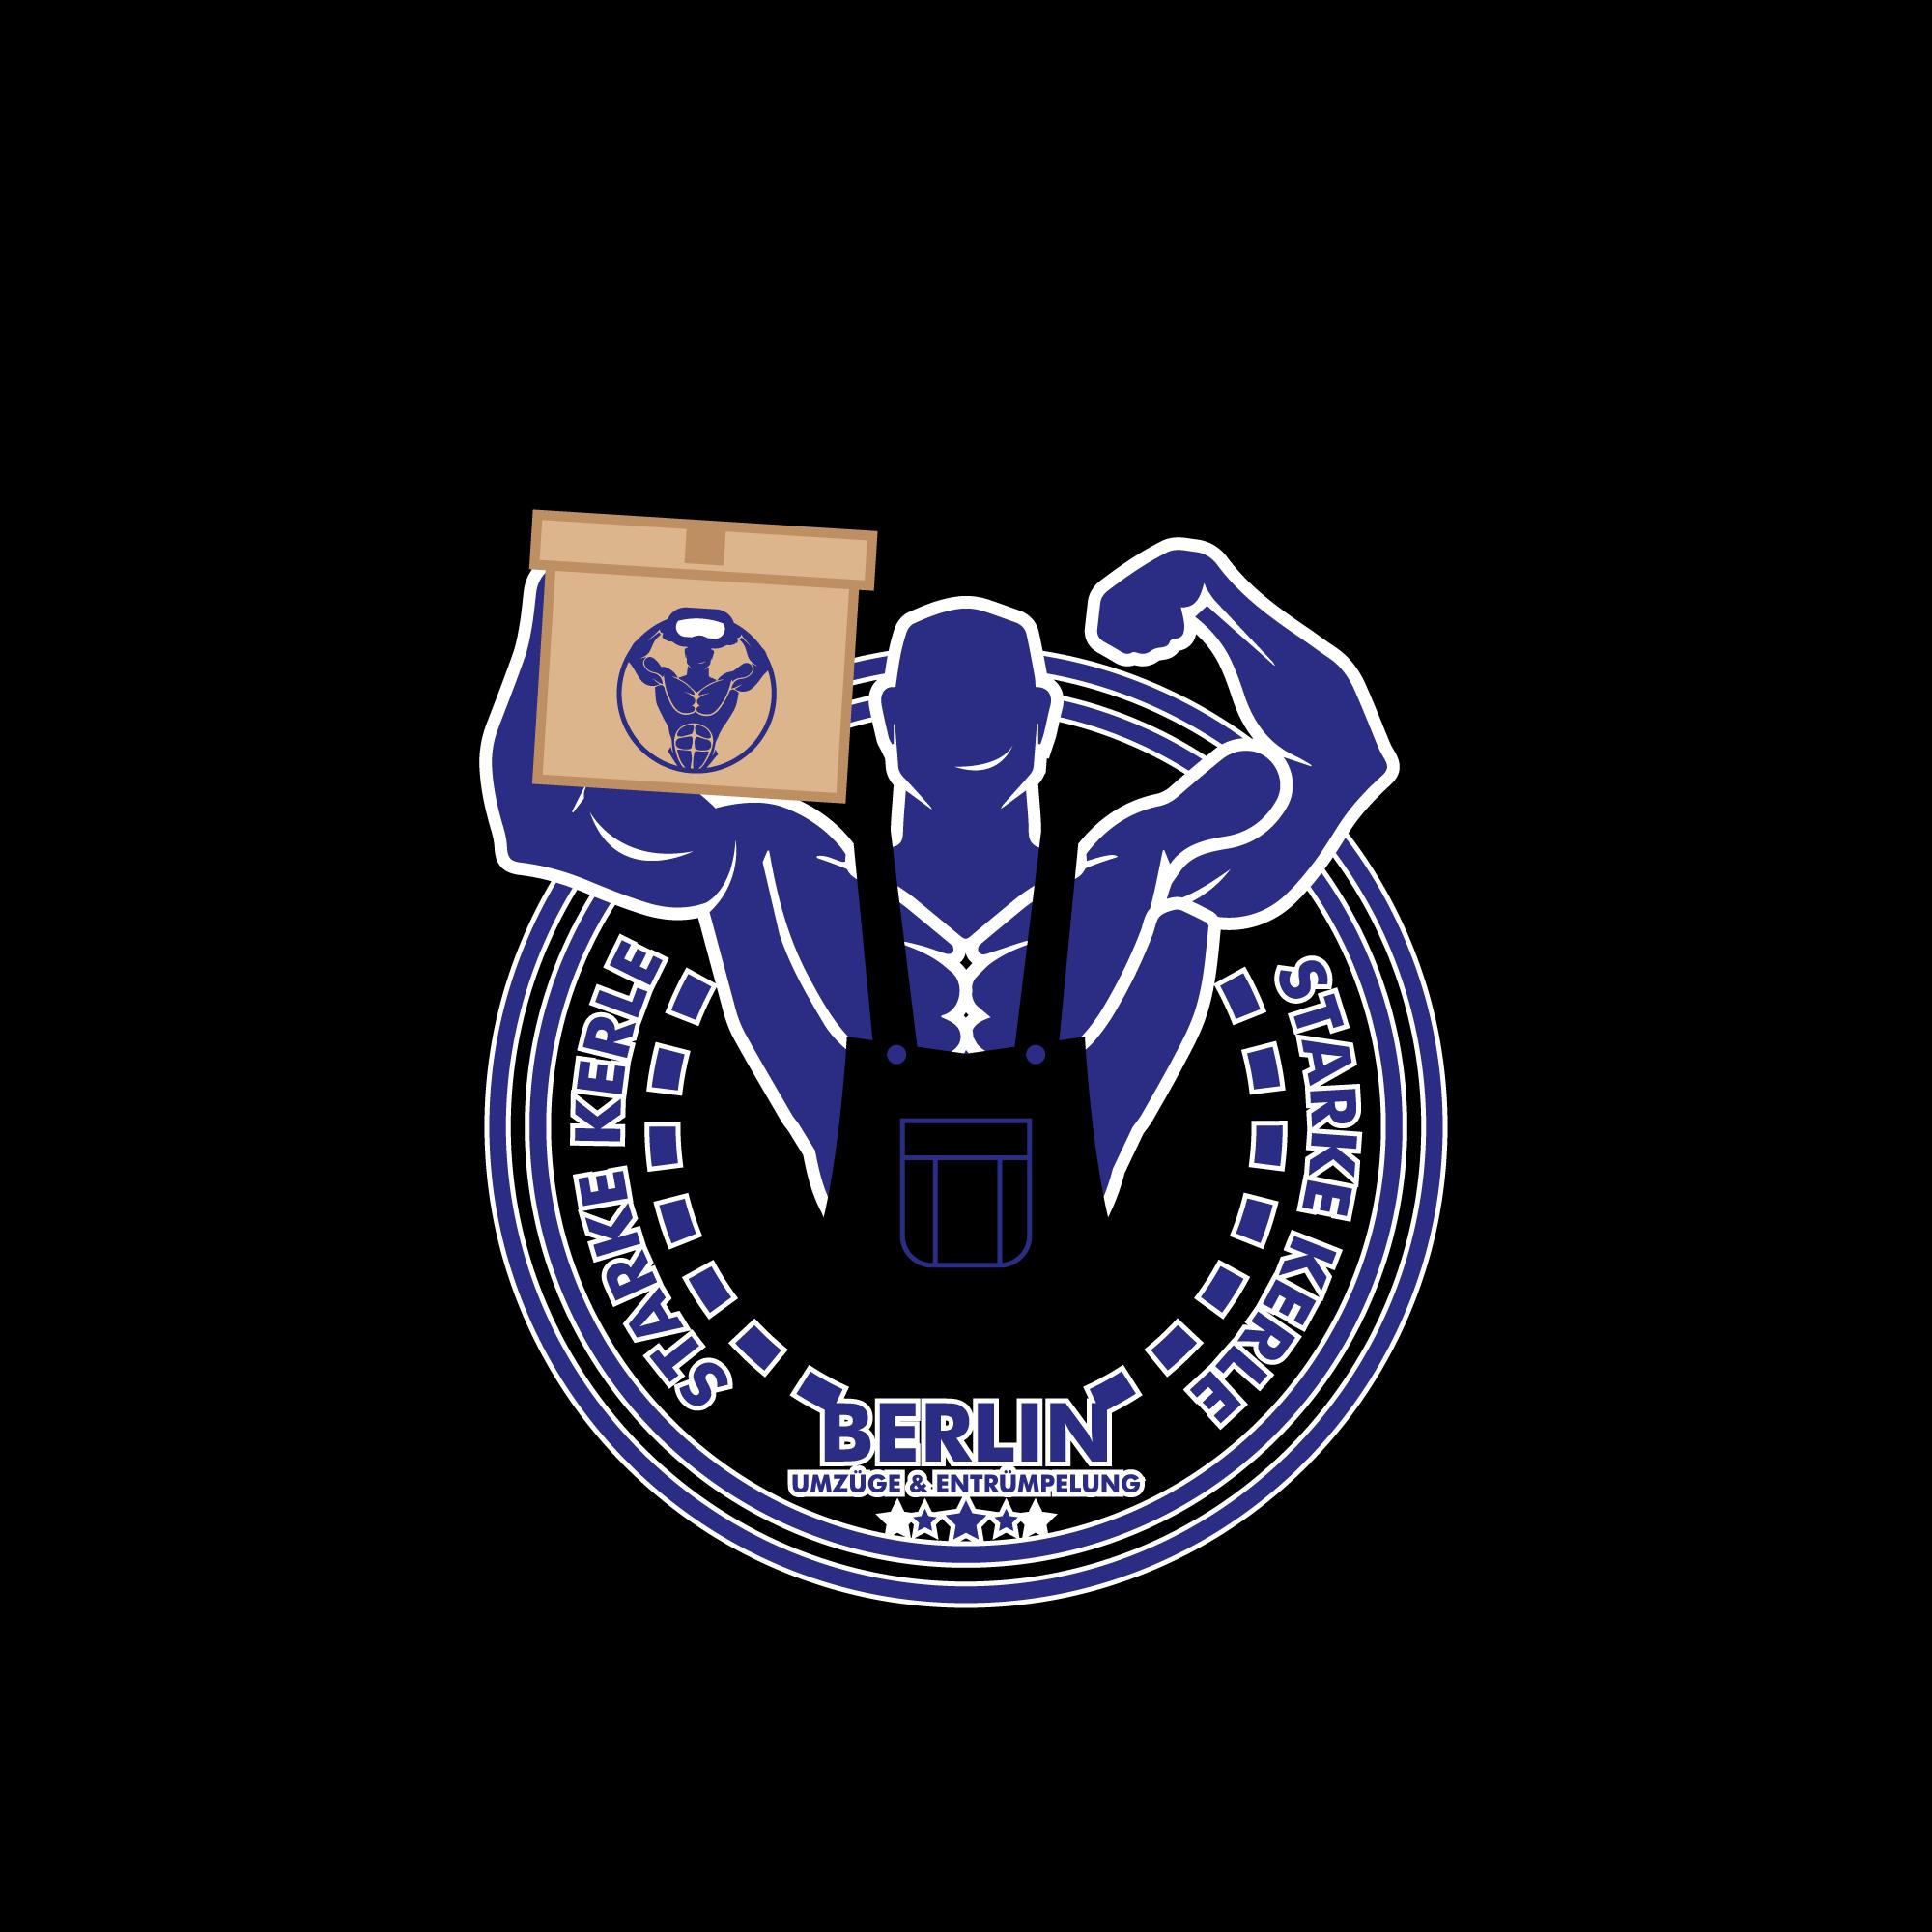 starke-kerle-entruempelung-und-transporte-logo